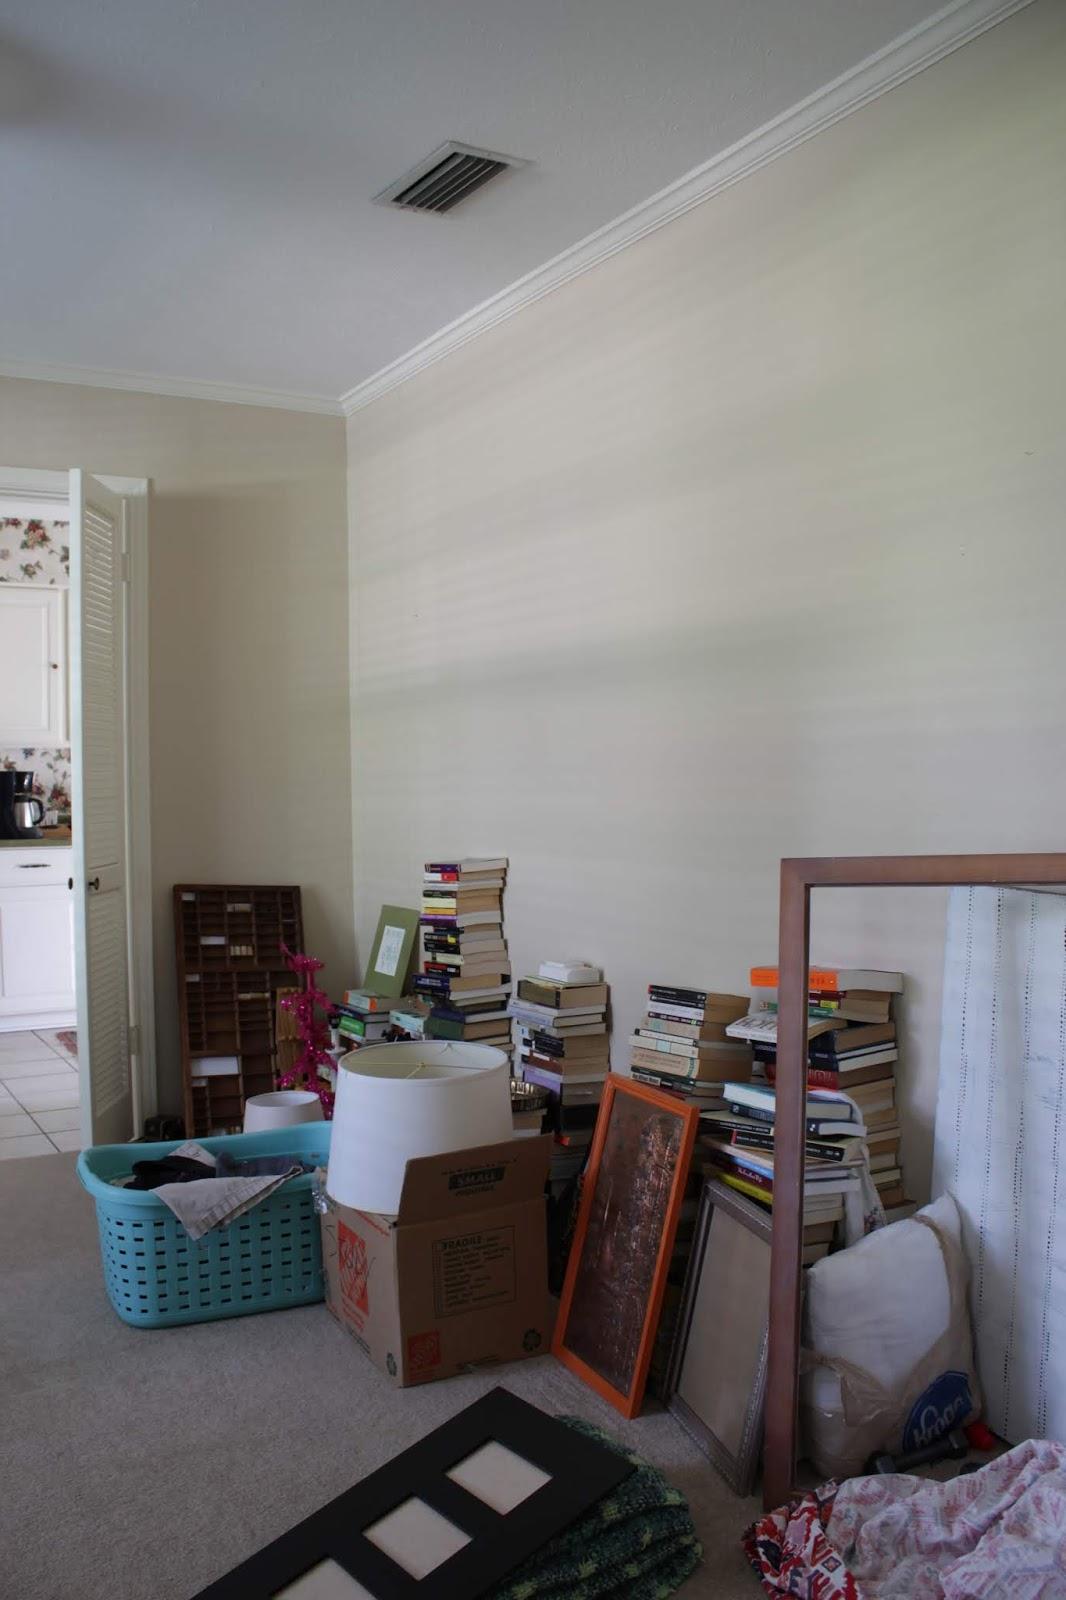 House Homemade New Home tour: 3 weeks progress